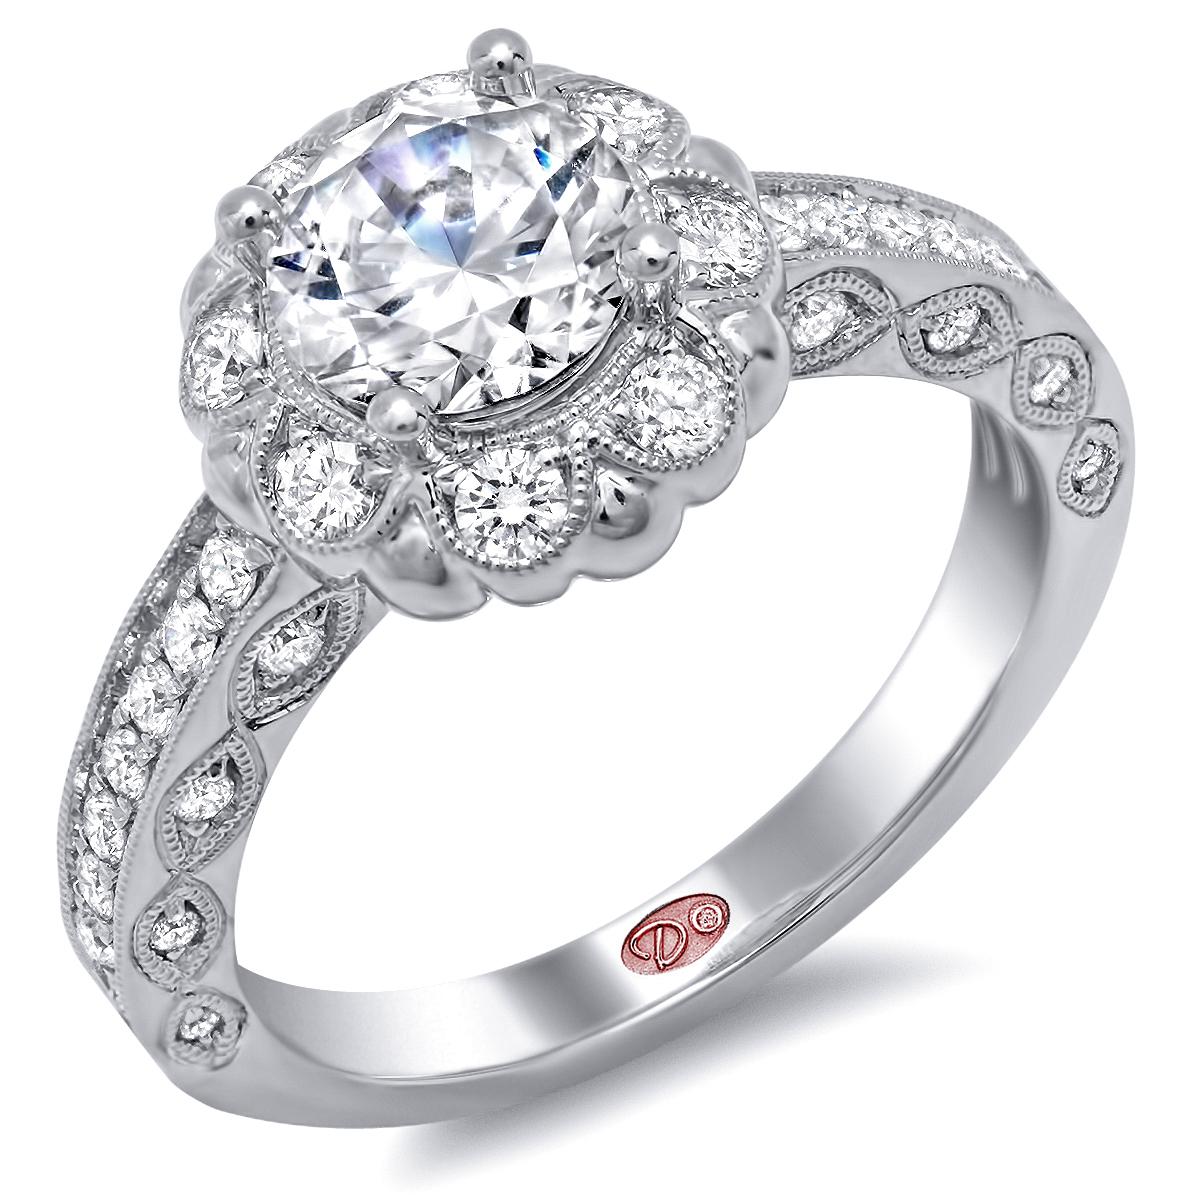 flower inspired engagement rings disney wedding ring Post navigation